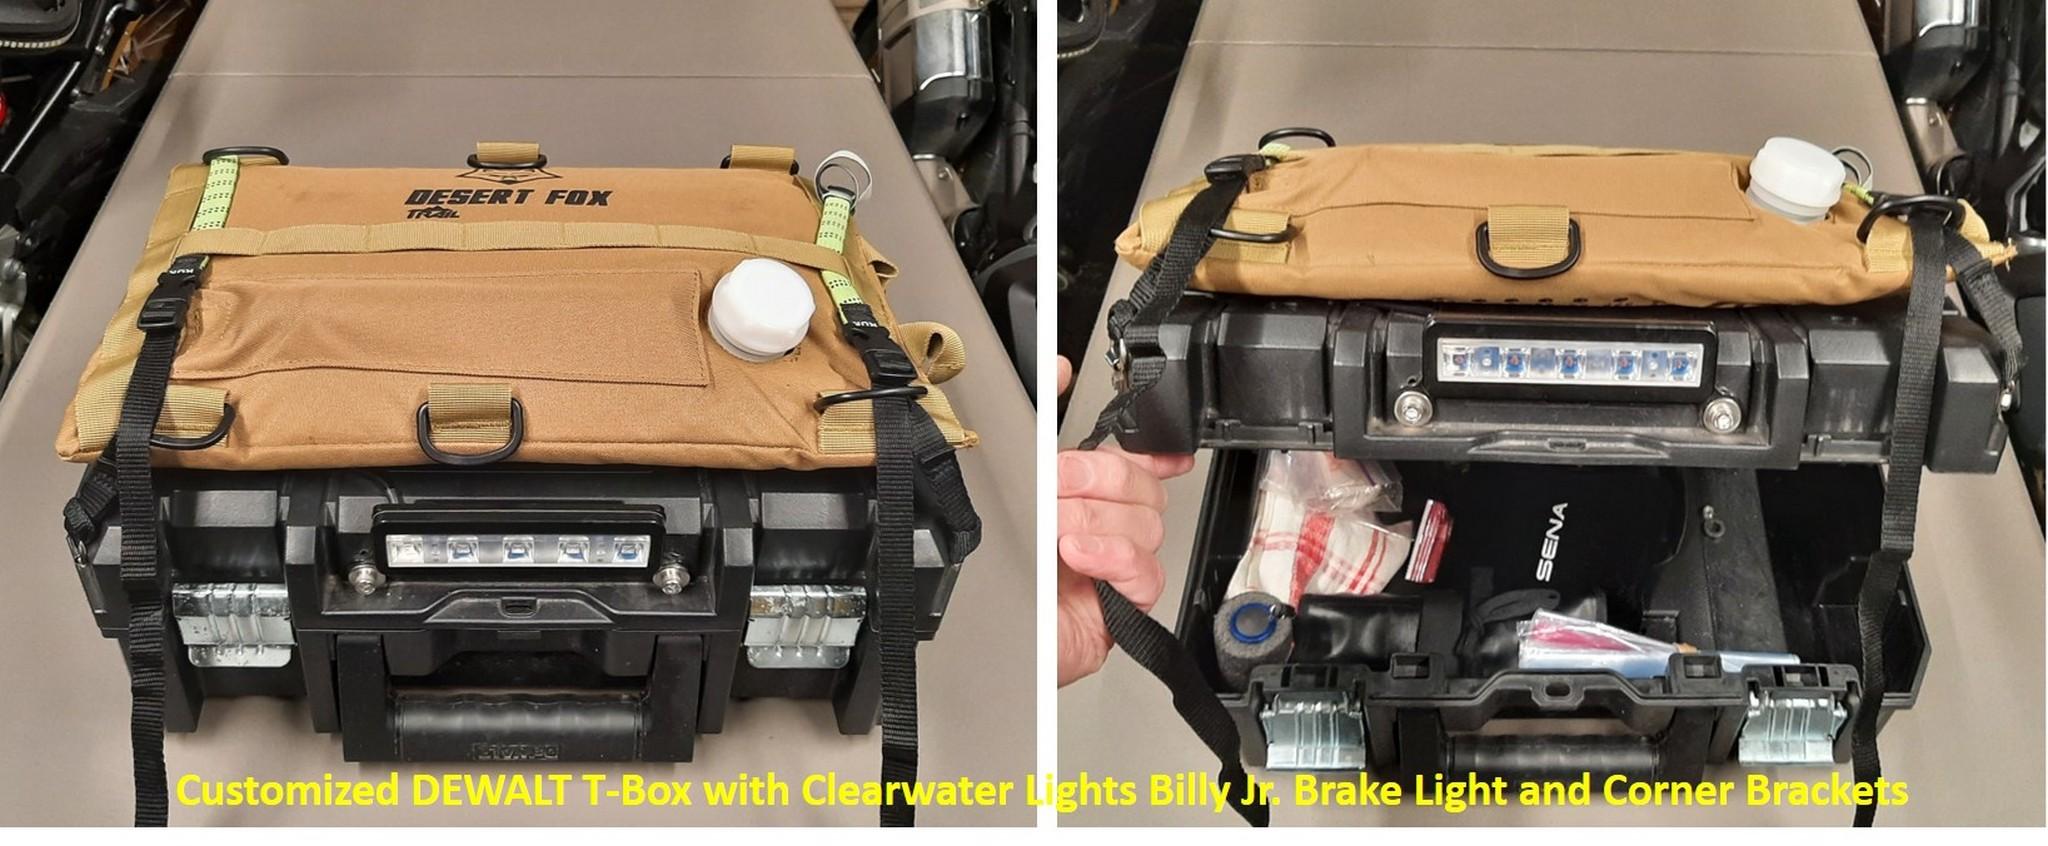 Fuel cell mounted to custom Dewalt T-Box